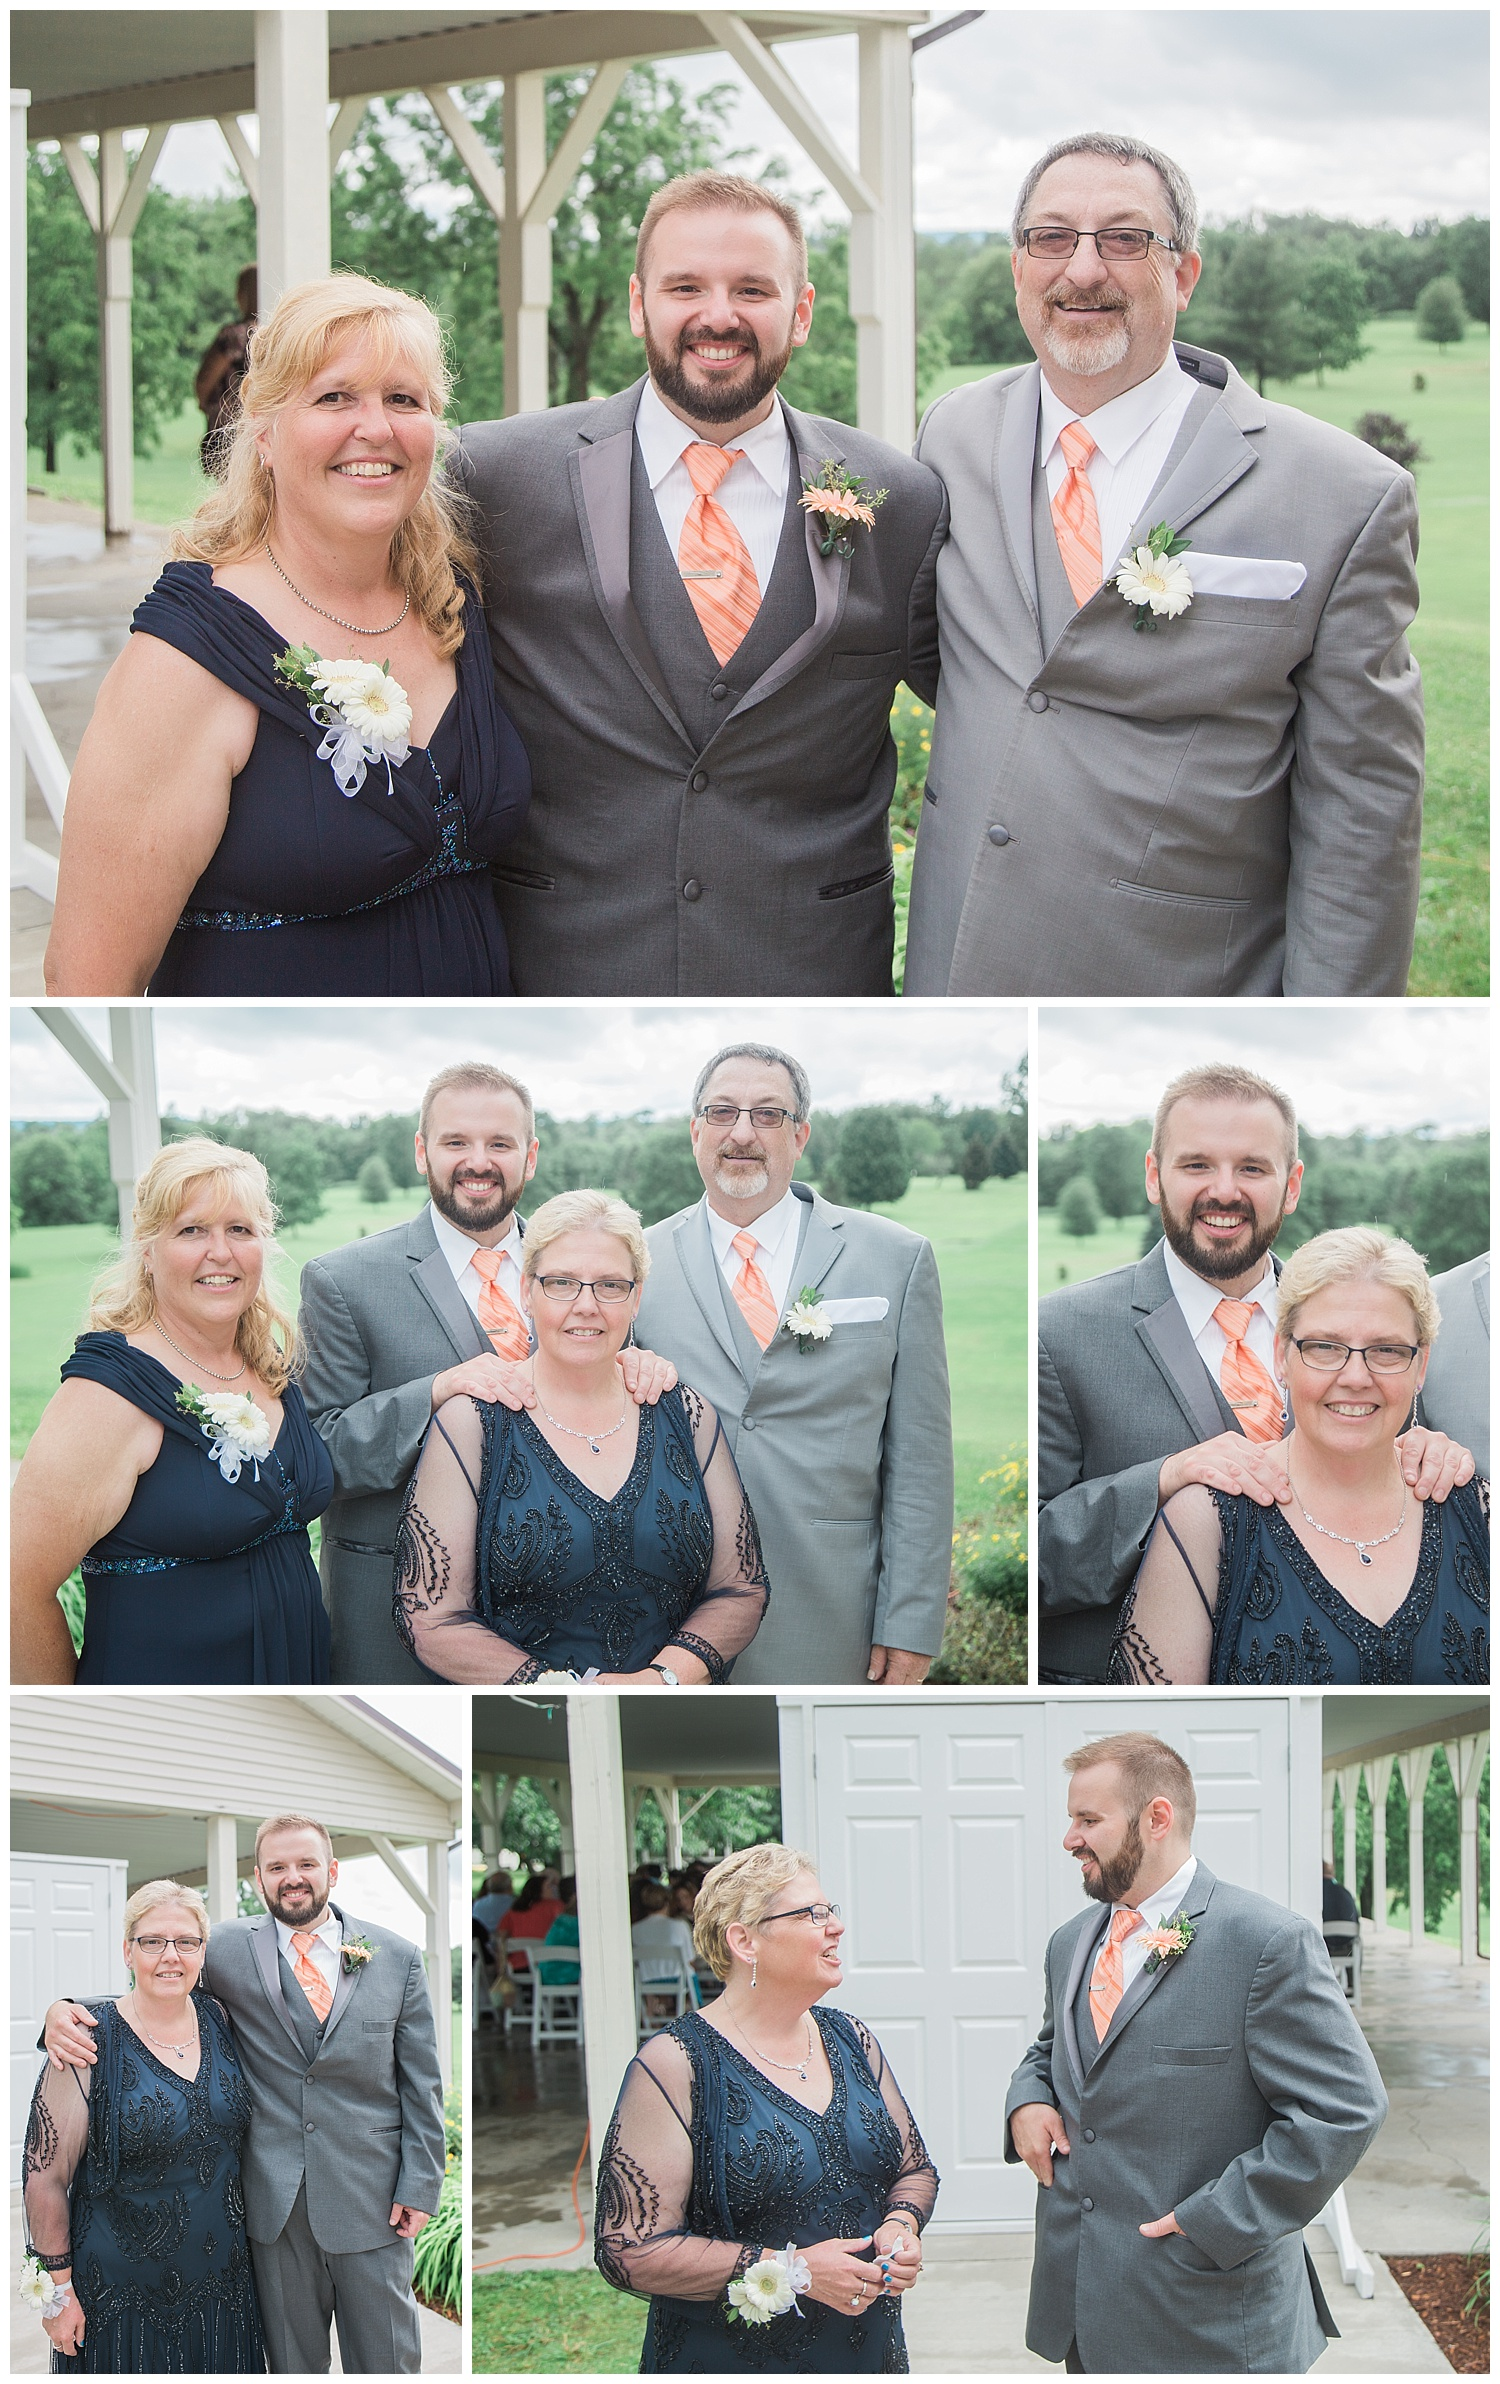 Brian and Molly Wed in Conesus NY - Lass & Beau-152_Buffalo wedding photography.jpg